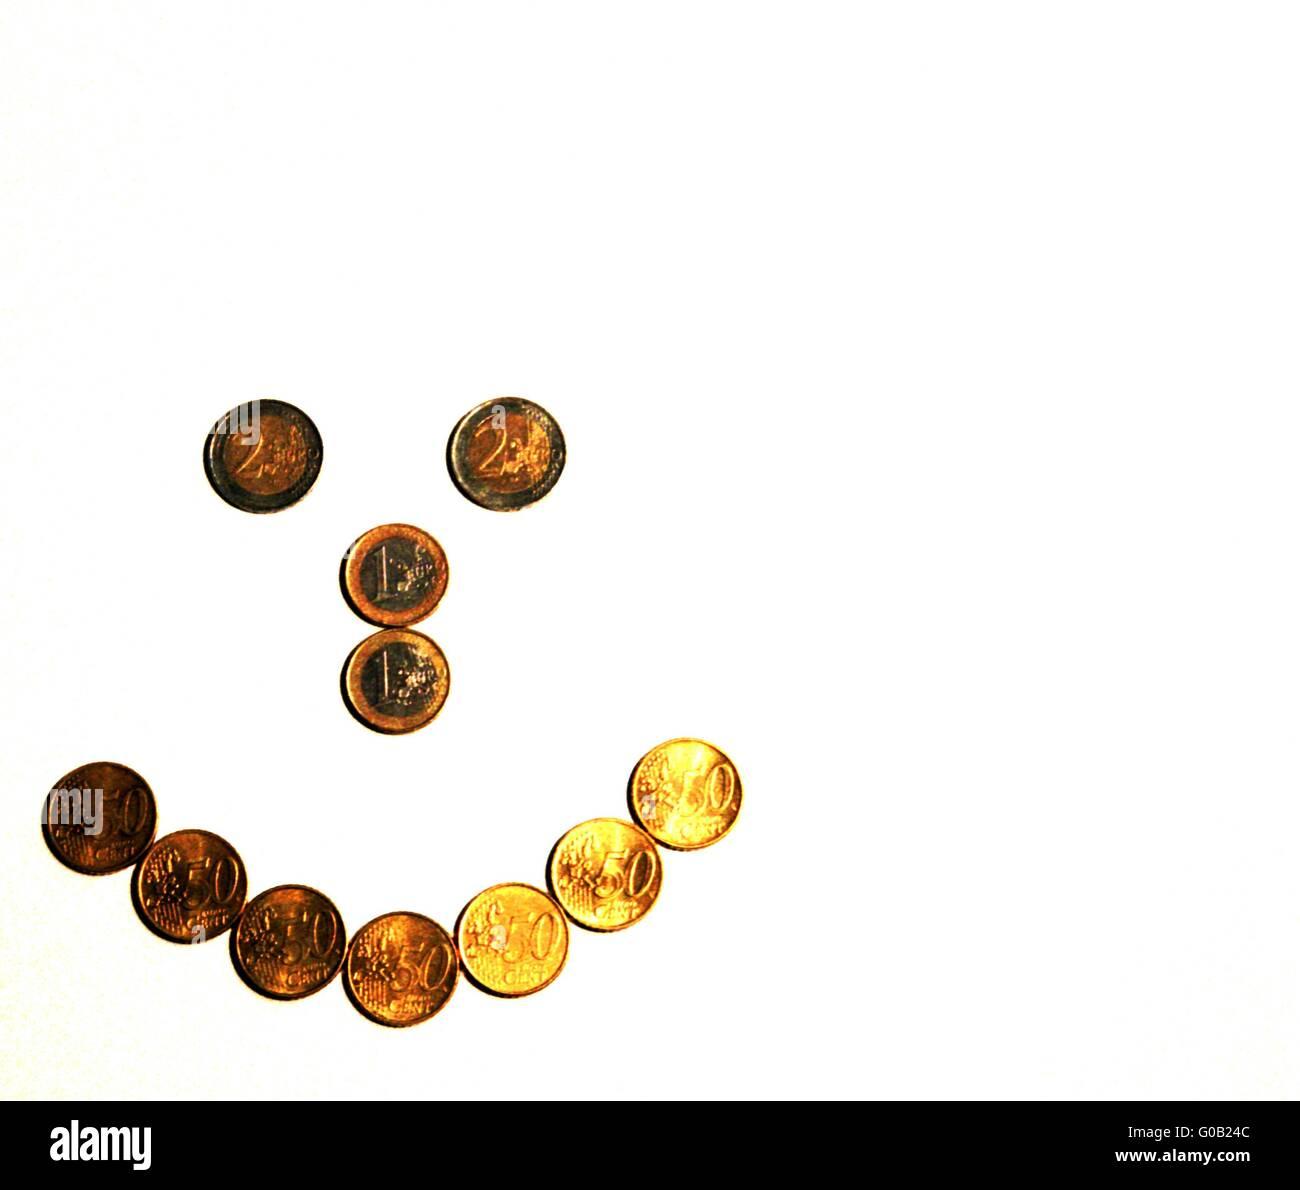 Money makes you happy Cut - Stock Image